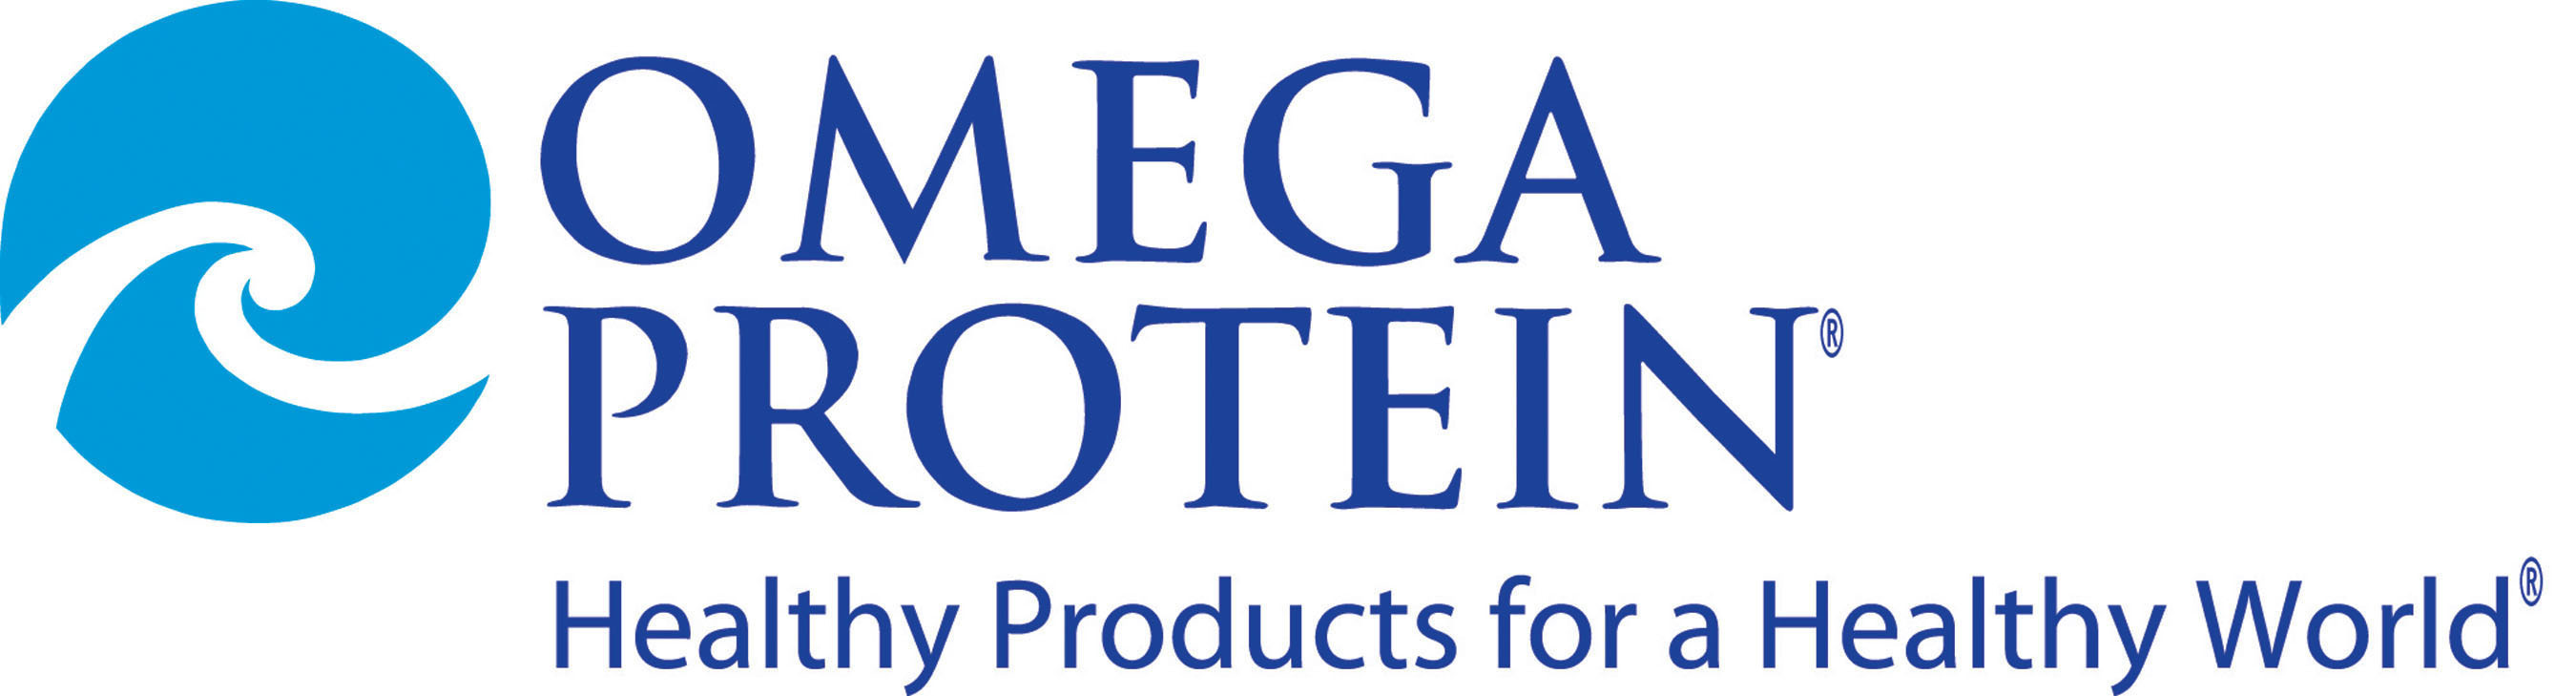 omega protein corporation logo sw funk industrial contractors inc